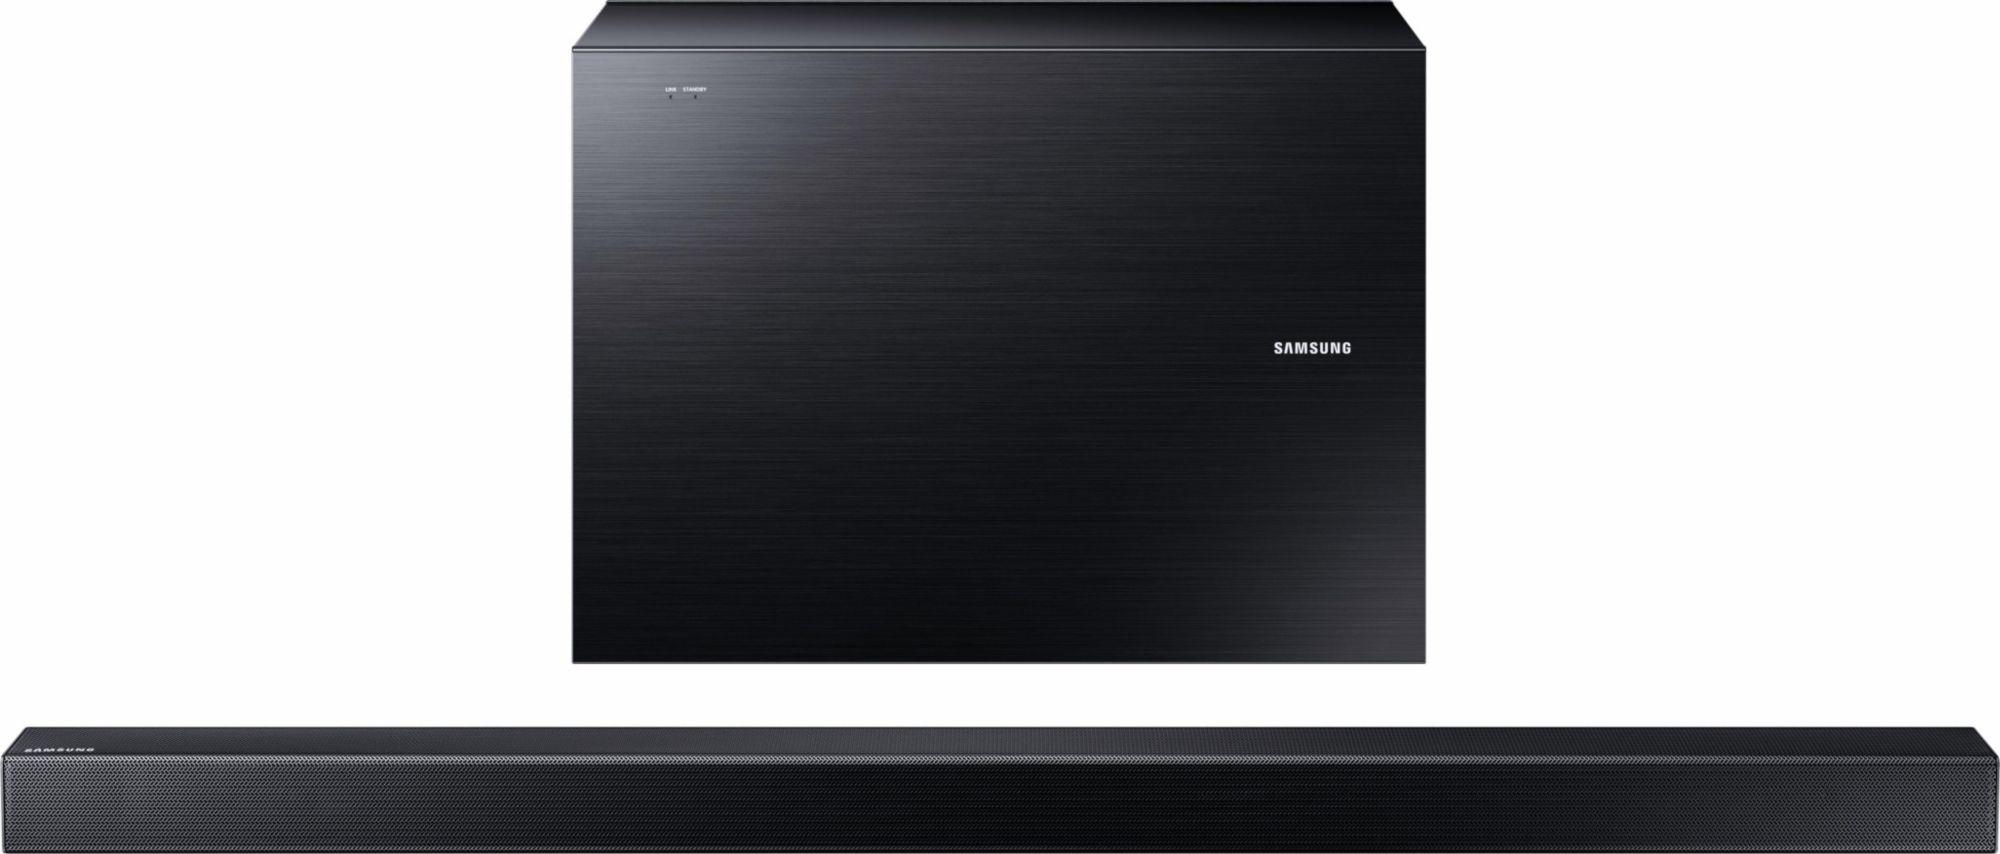 SAMSUNG HW-K650, Lautsprecher